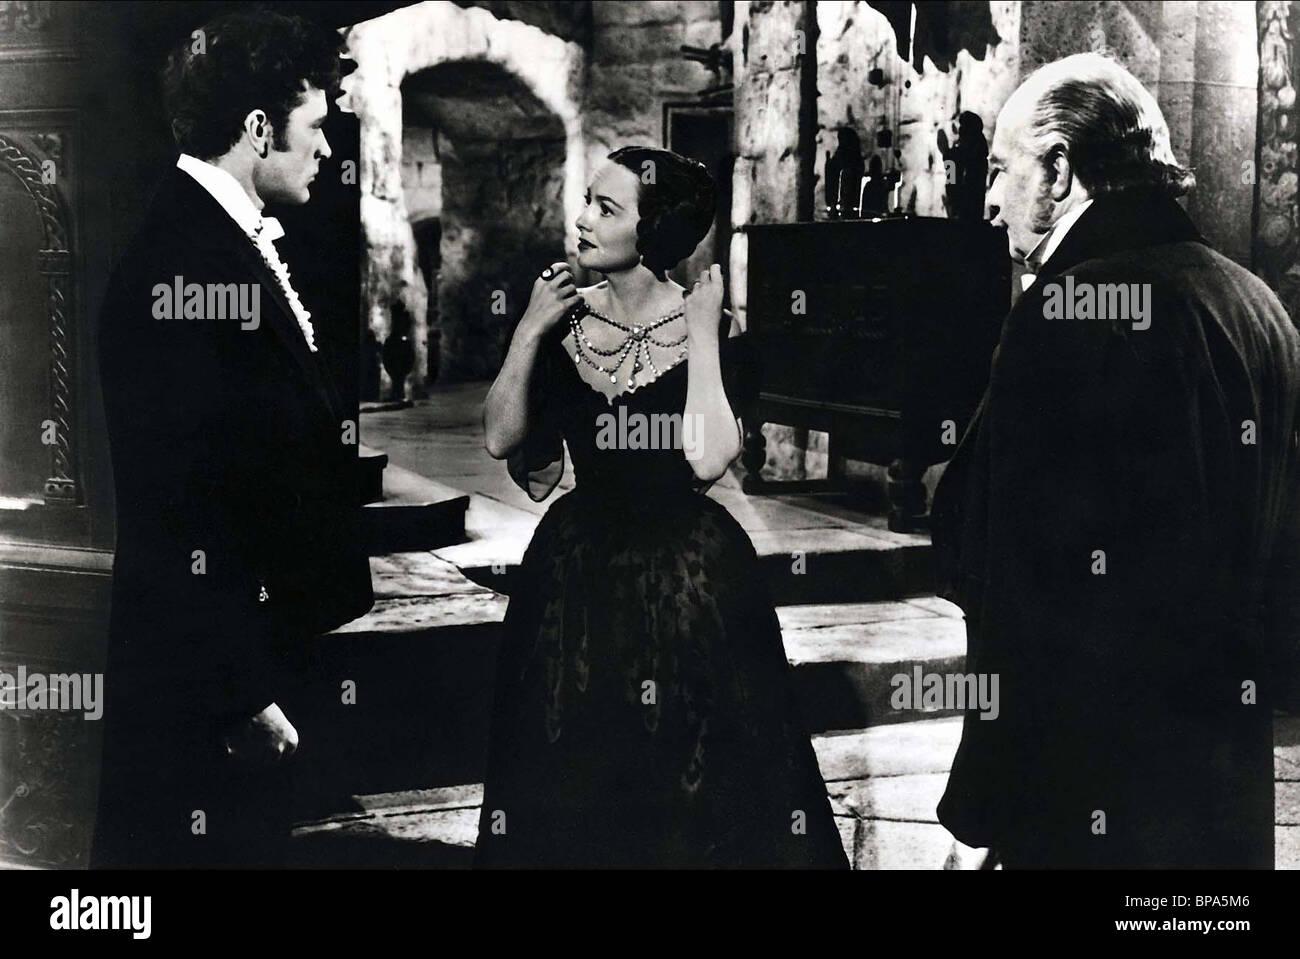 RICHARD BURTON OLIVIA DE HAVILLAND & RONALD SQUIRE MY COUSIN RACHEL (1952) - Stock Image